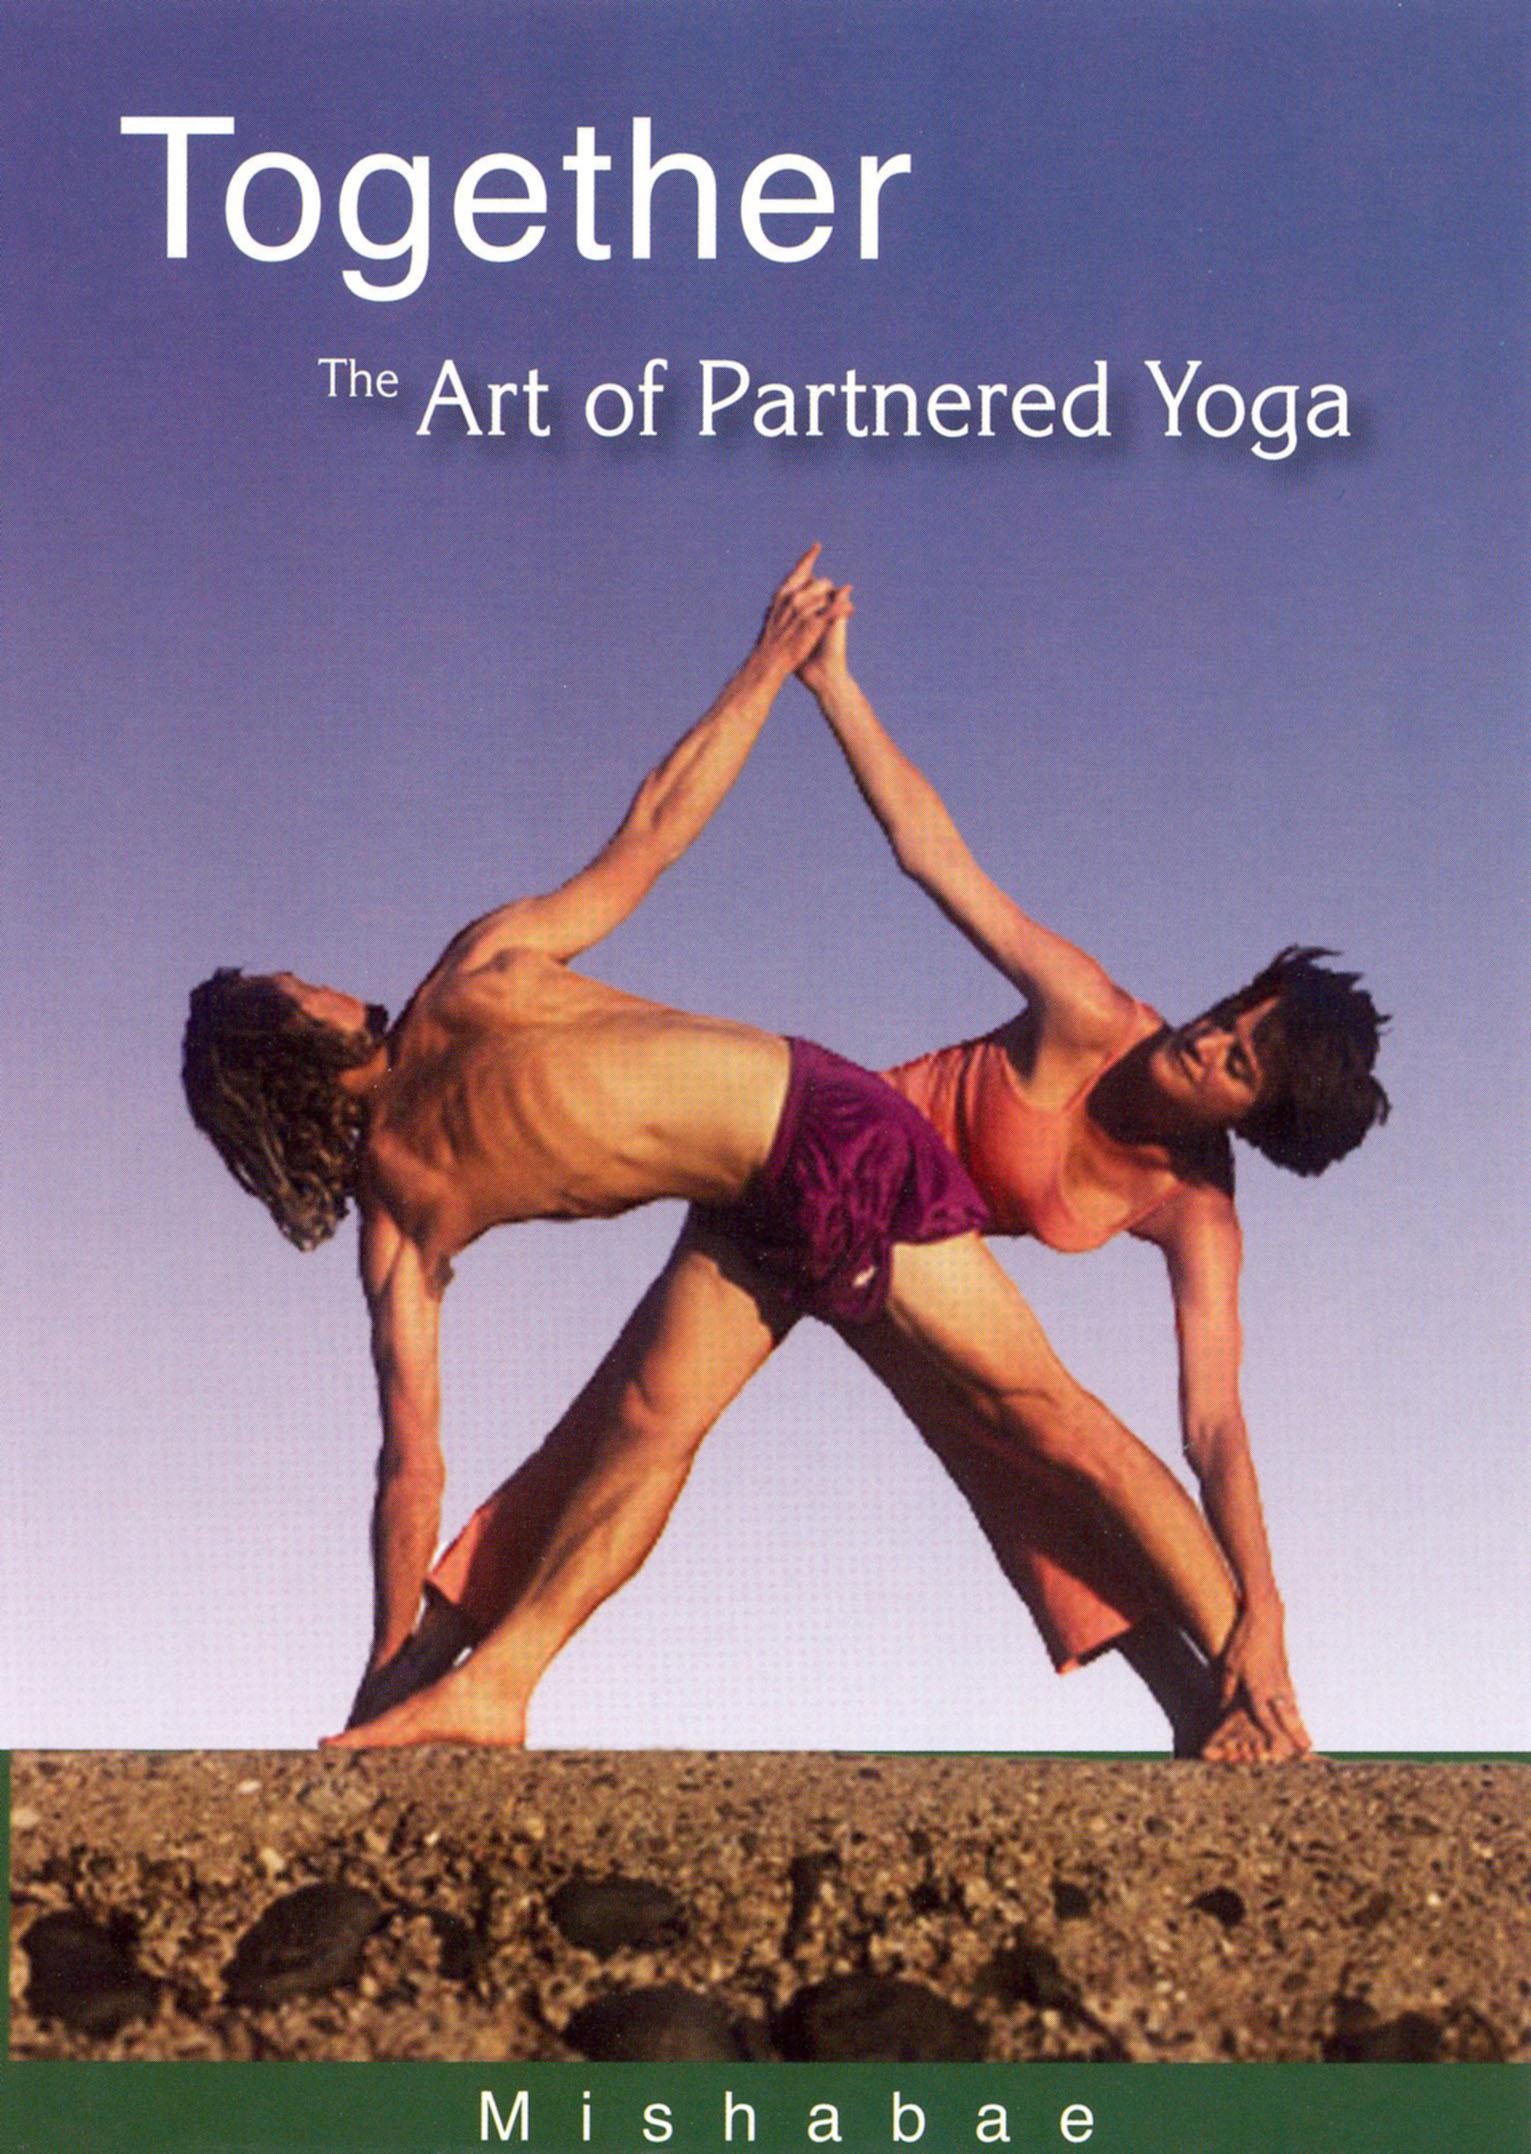 Together: The Art of Partnered Yoga